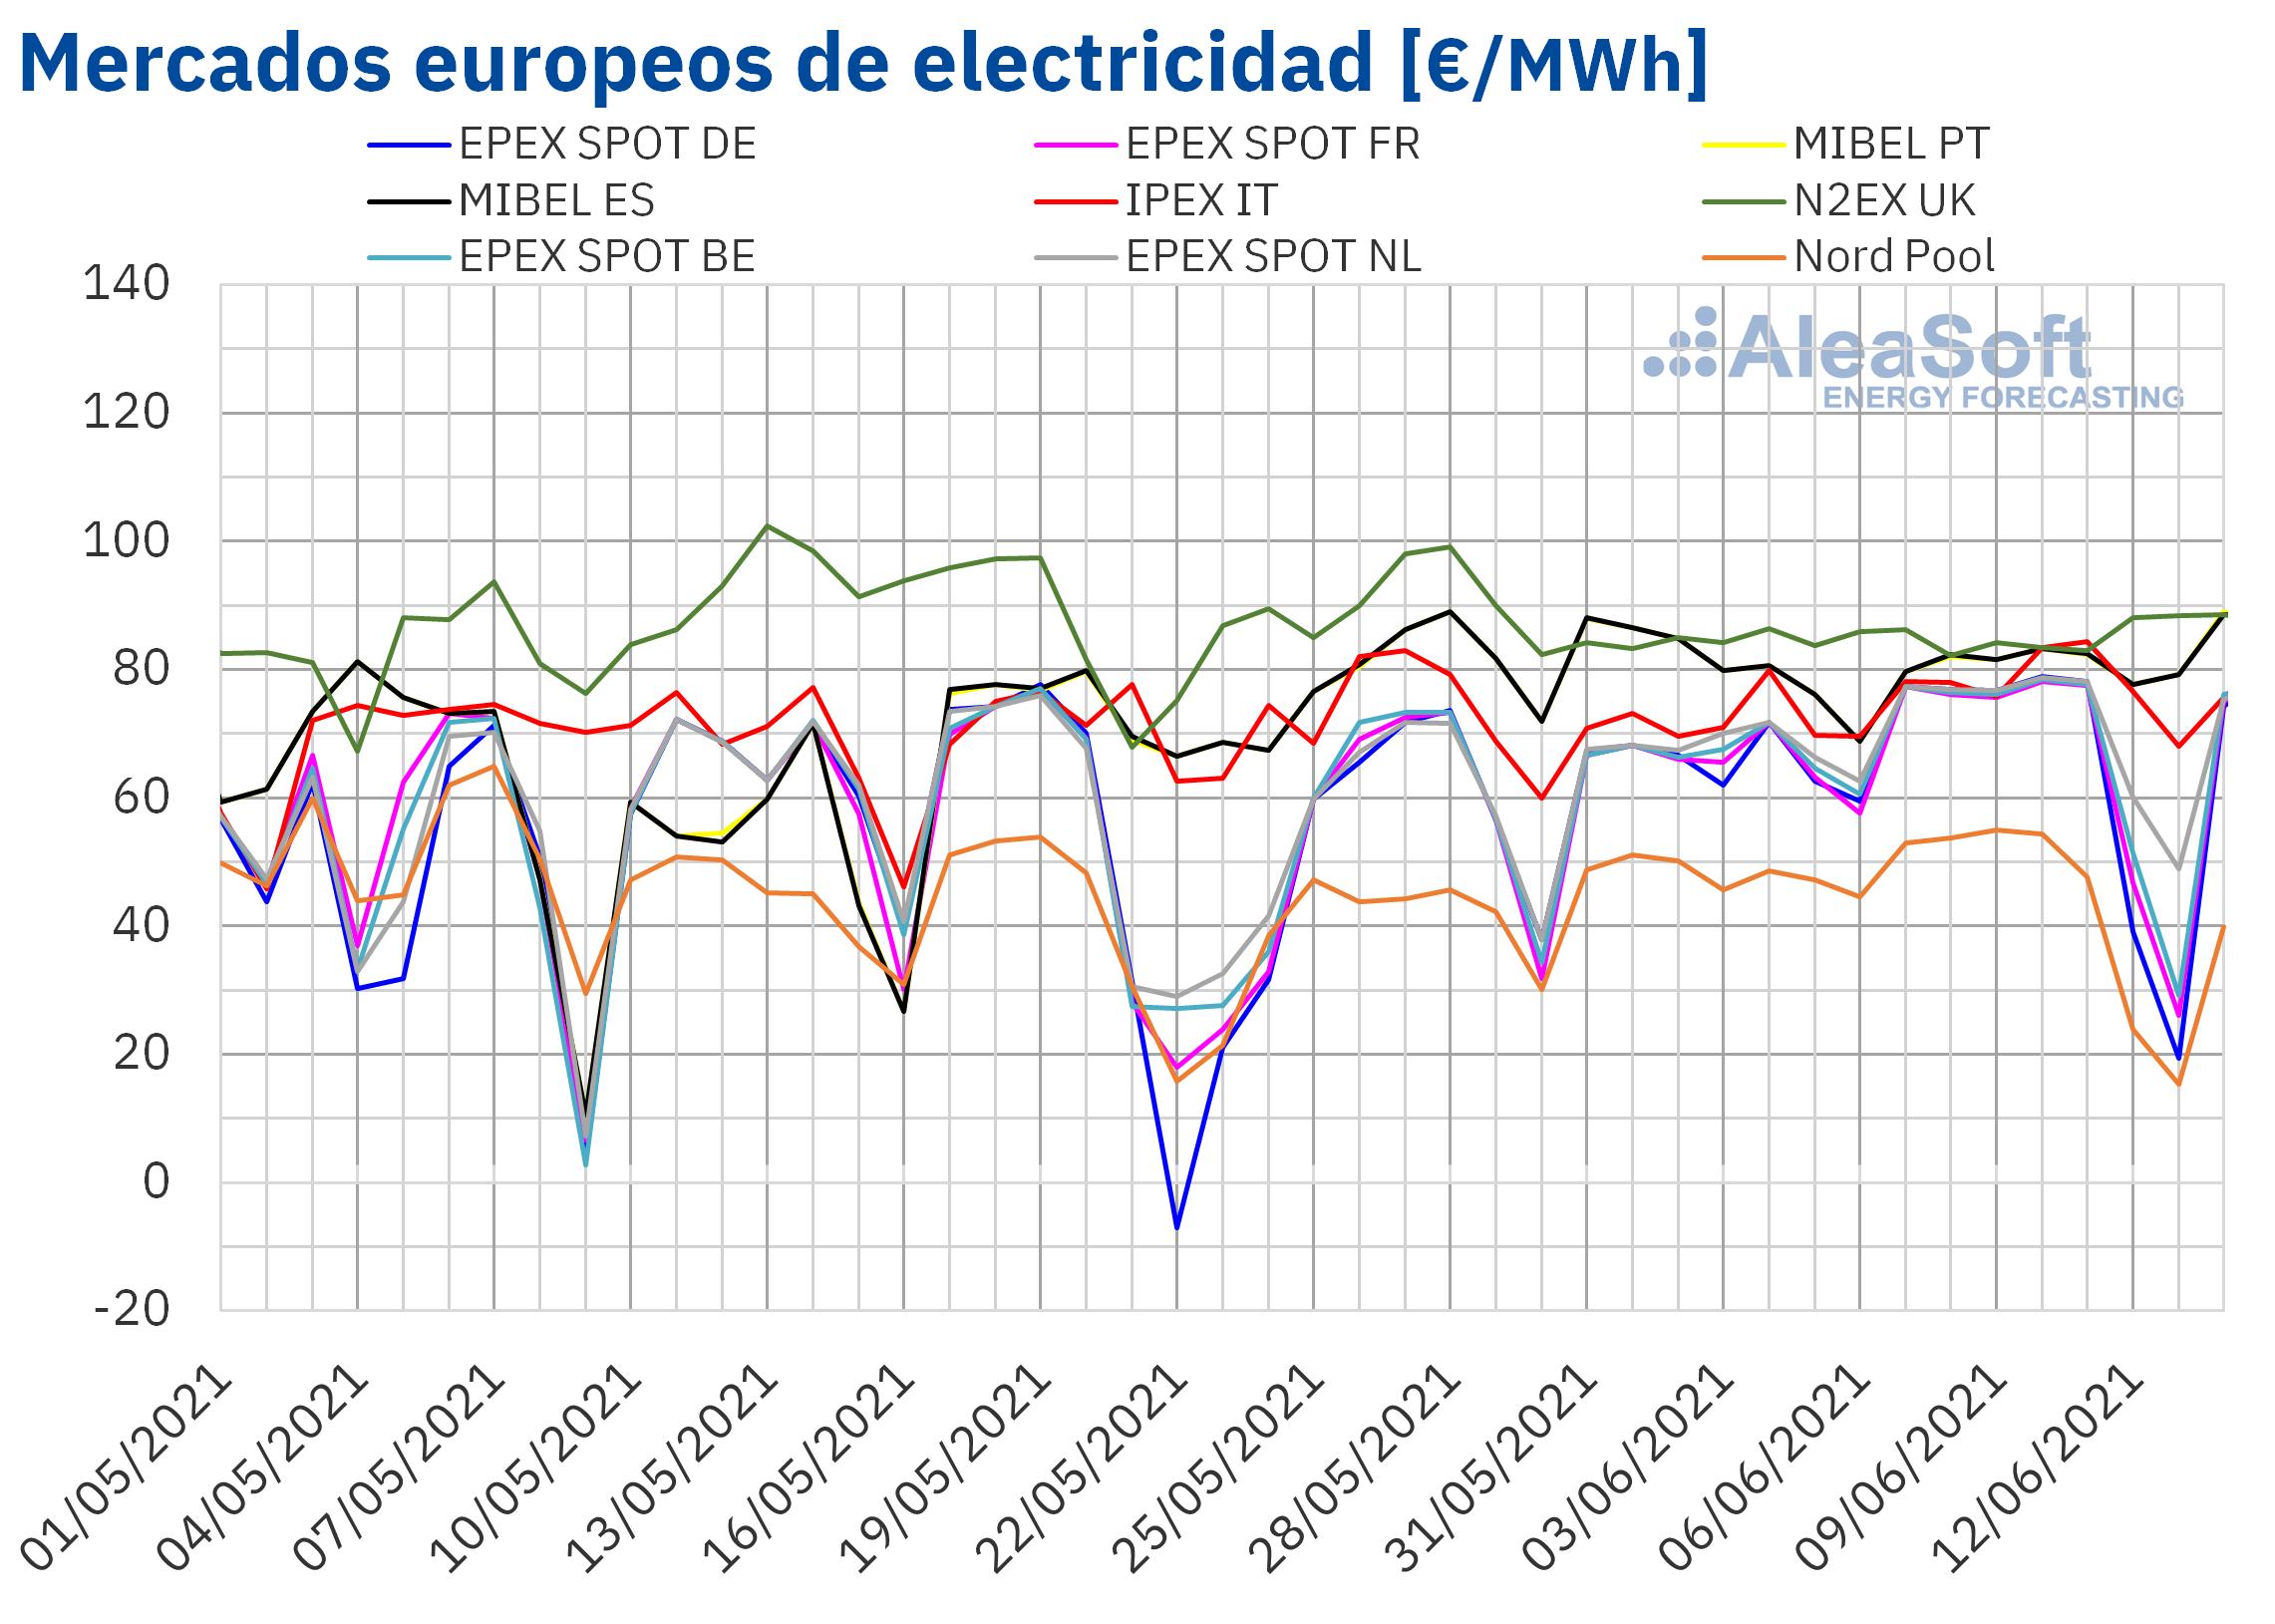 AleaSoft: Fin de semana de contrastes en los mercados europeos: de precios negativos a cercanos a 90 ?/MWh